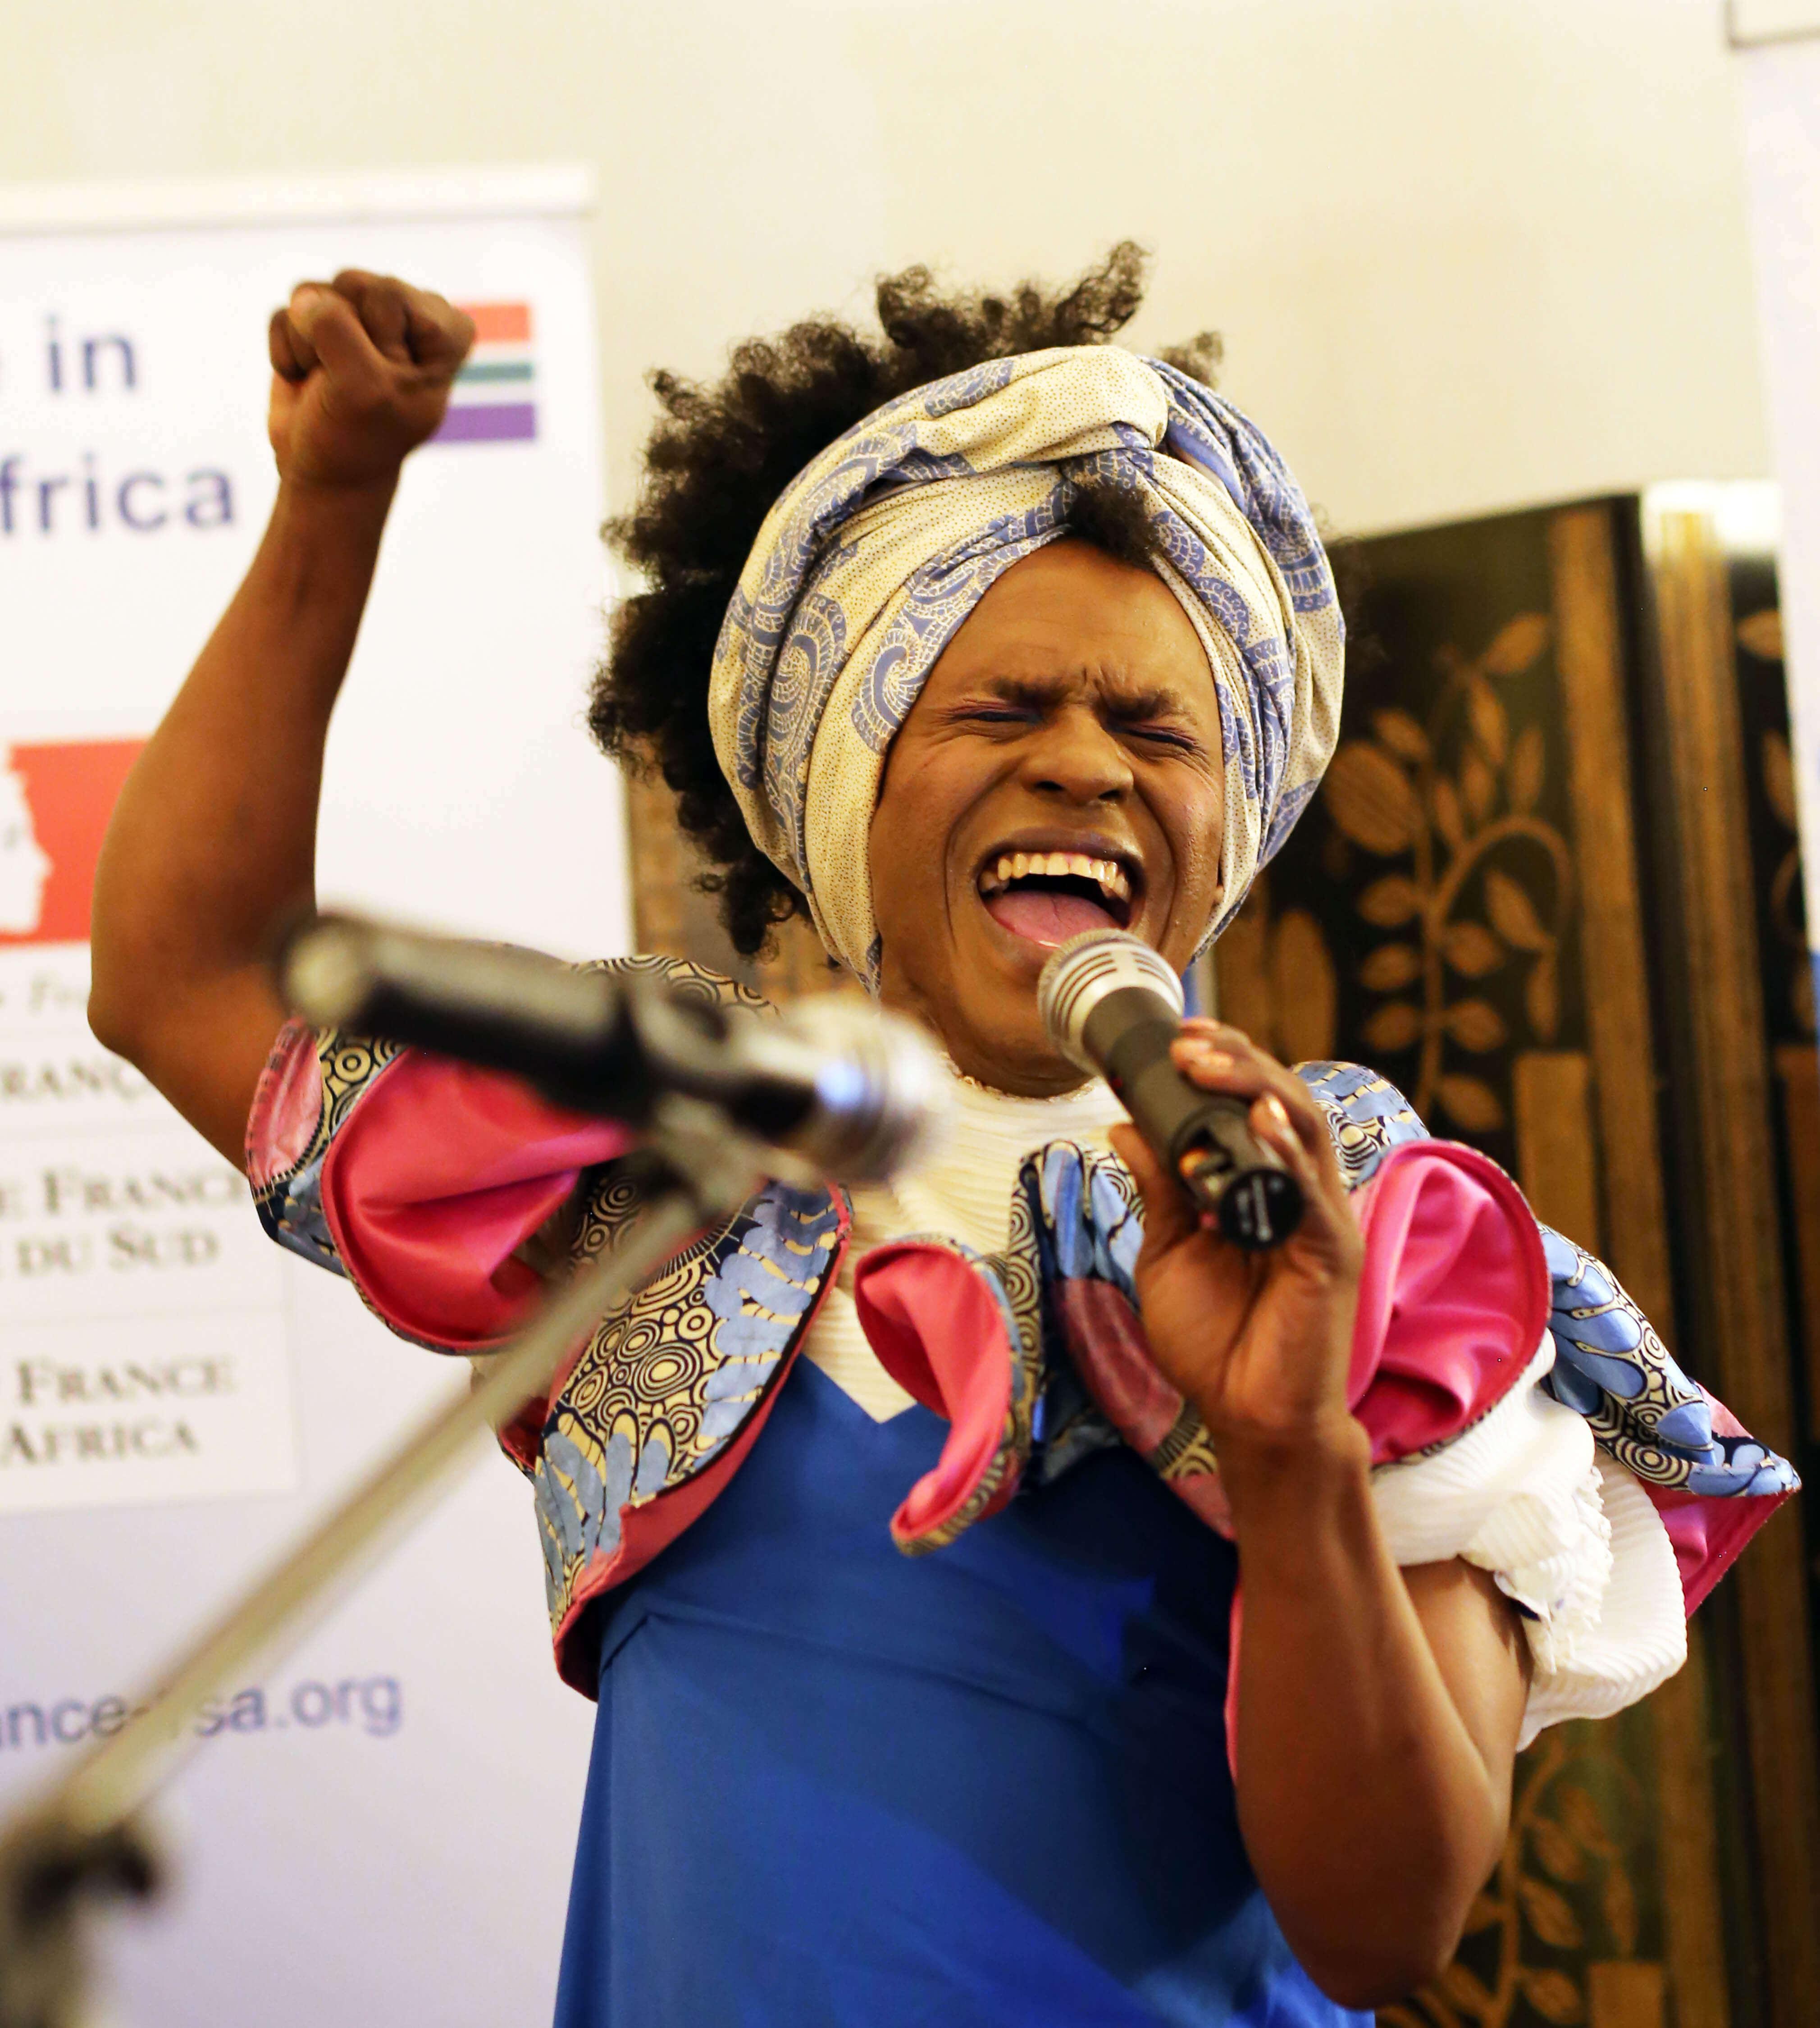 Odidi Odidiva Mfenyana performing during the award ceremony. Photography: Lerato Dumse. Courtesy of the photographer.